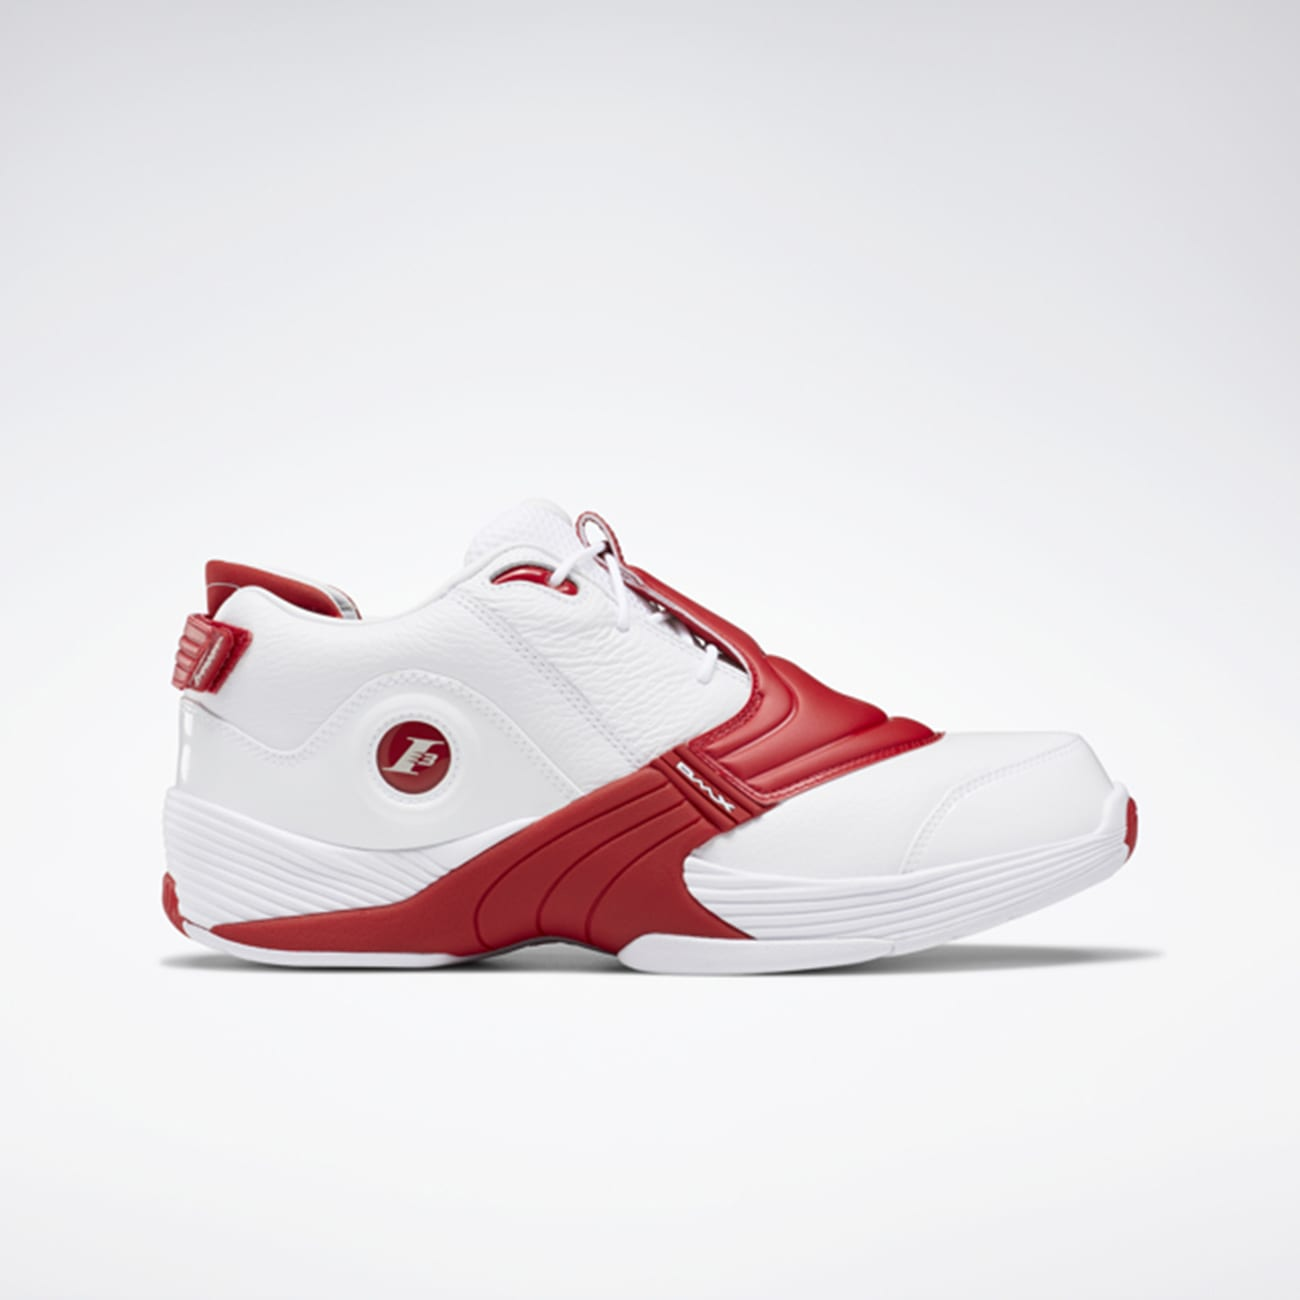 gg_sneakerhead_7